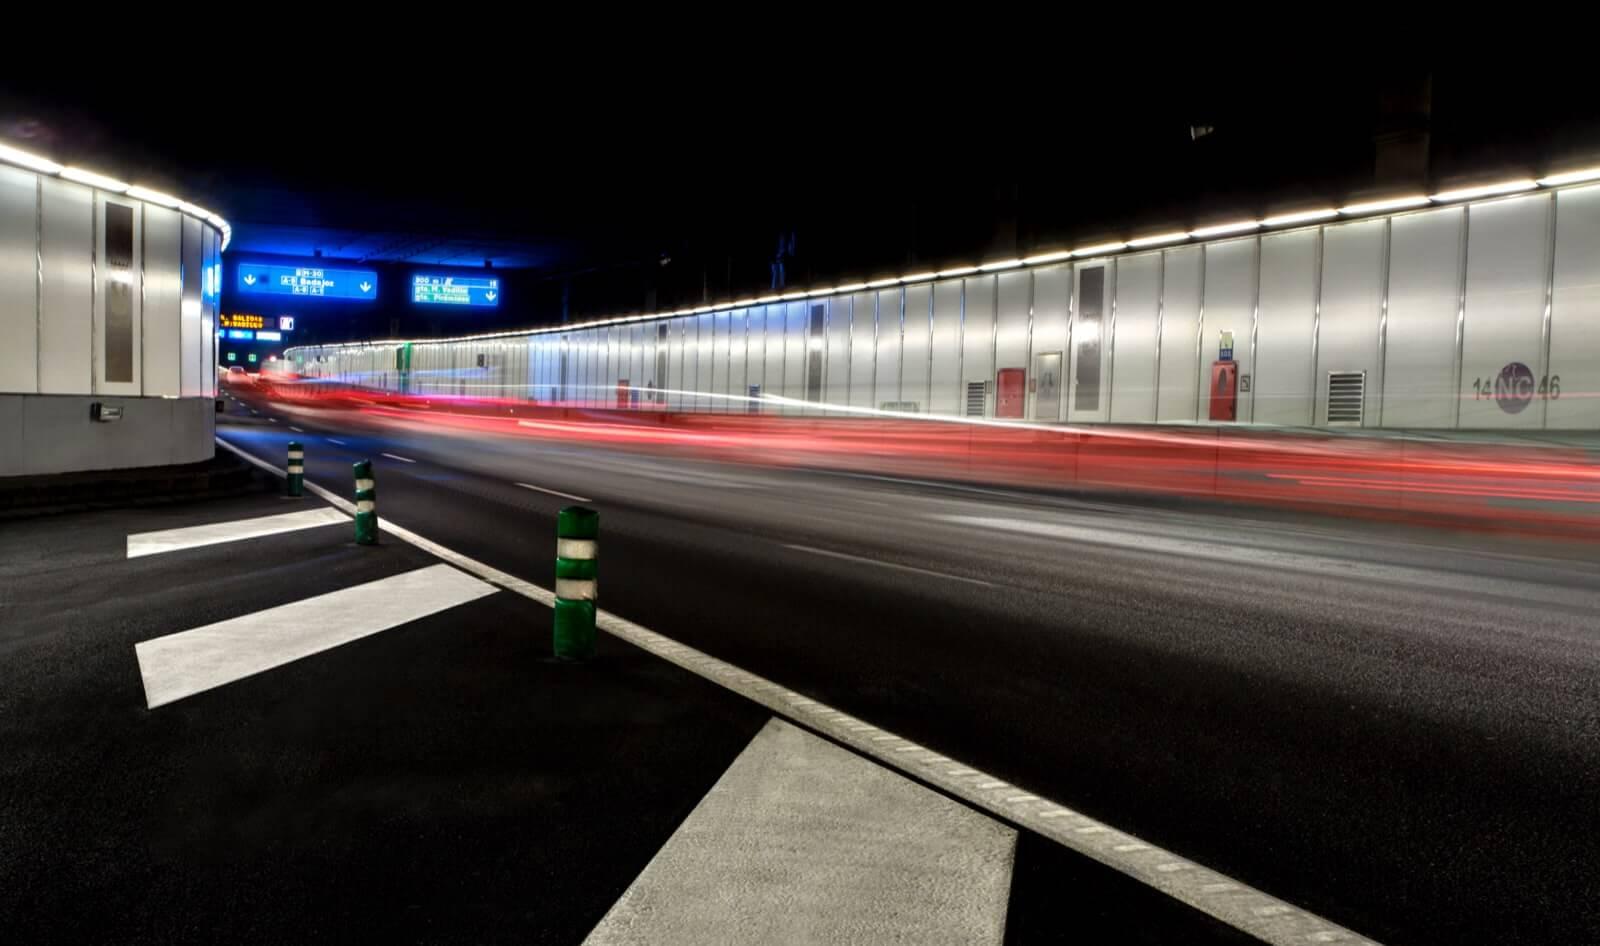 túneles m30 madrid río con premios